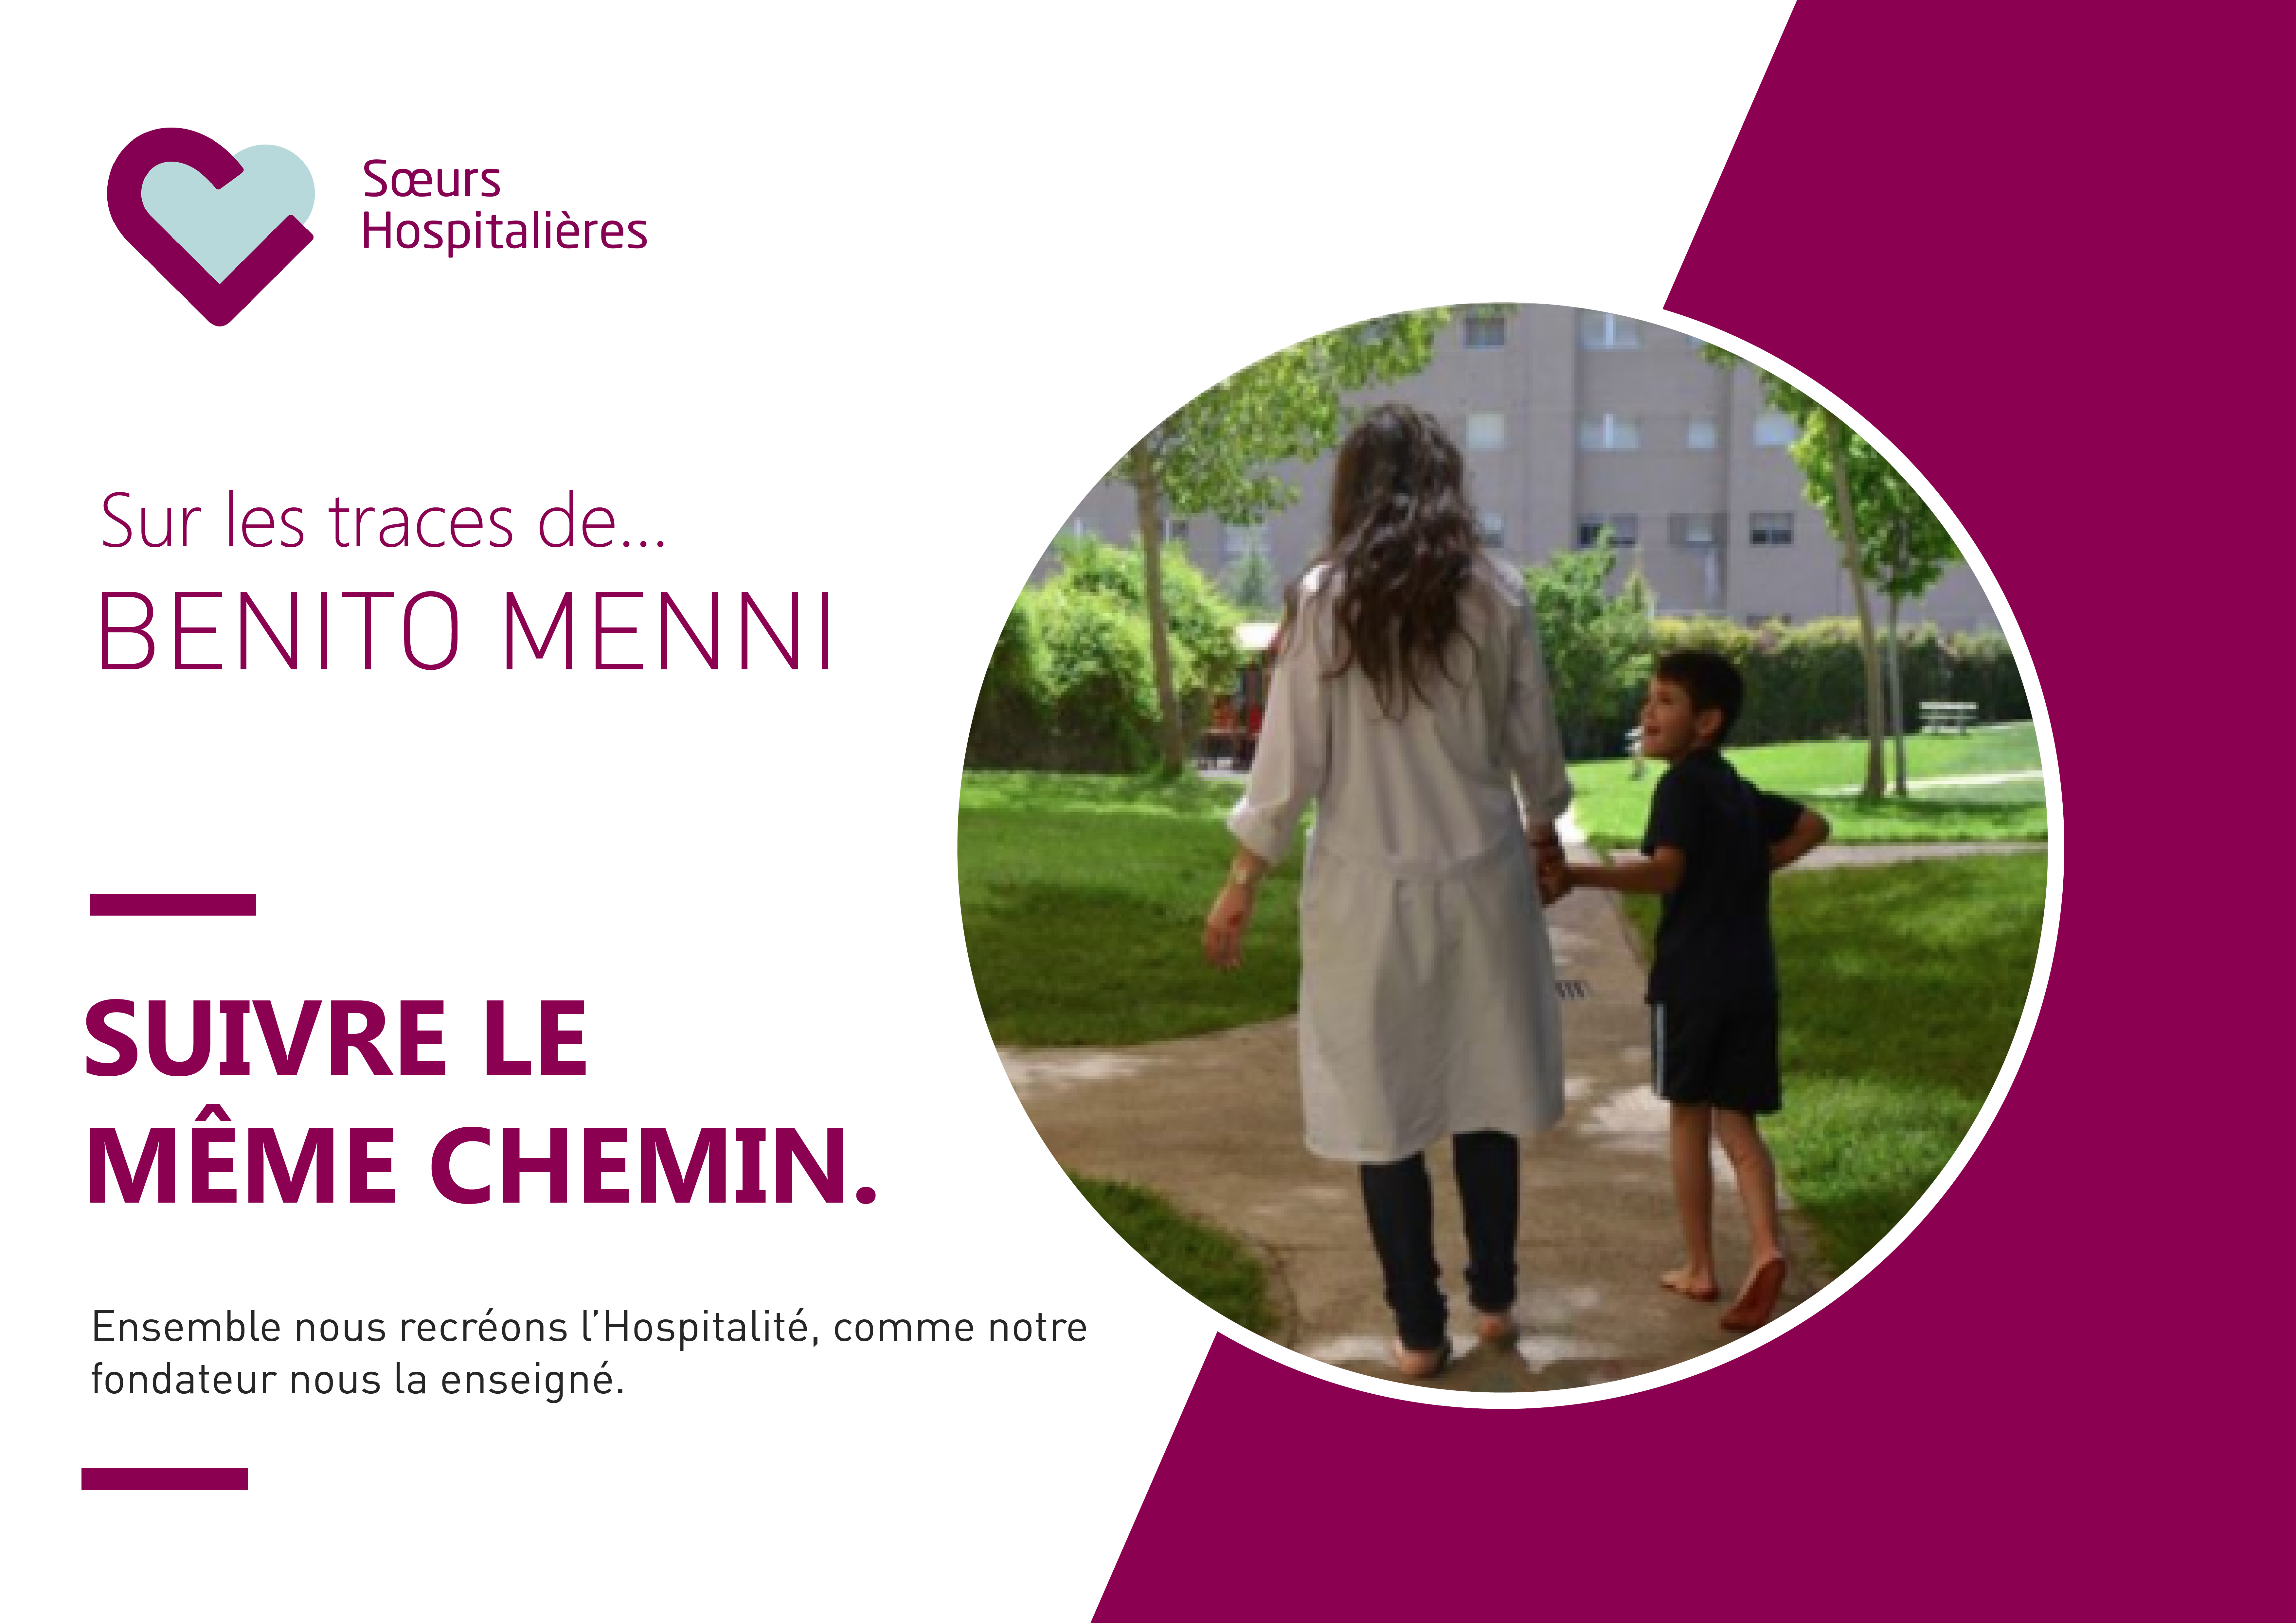 benitomenni_imagenes_3